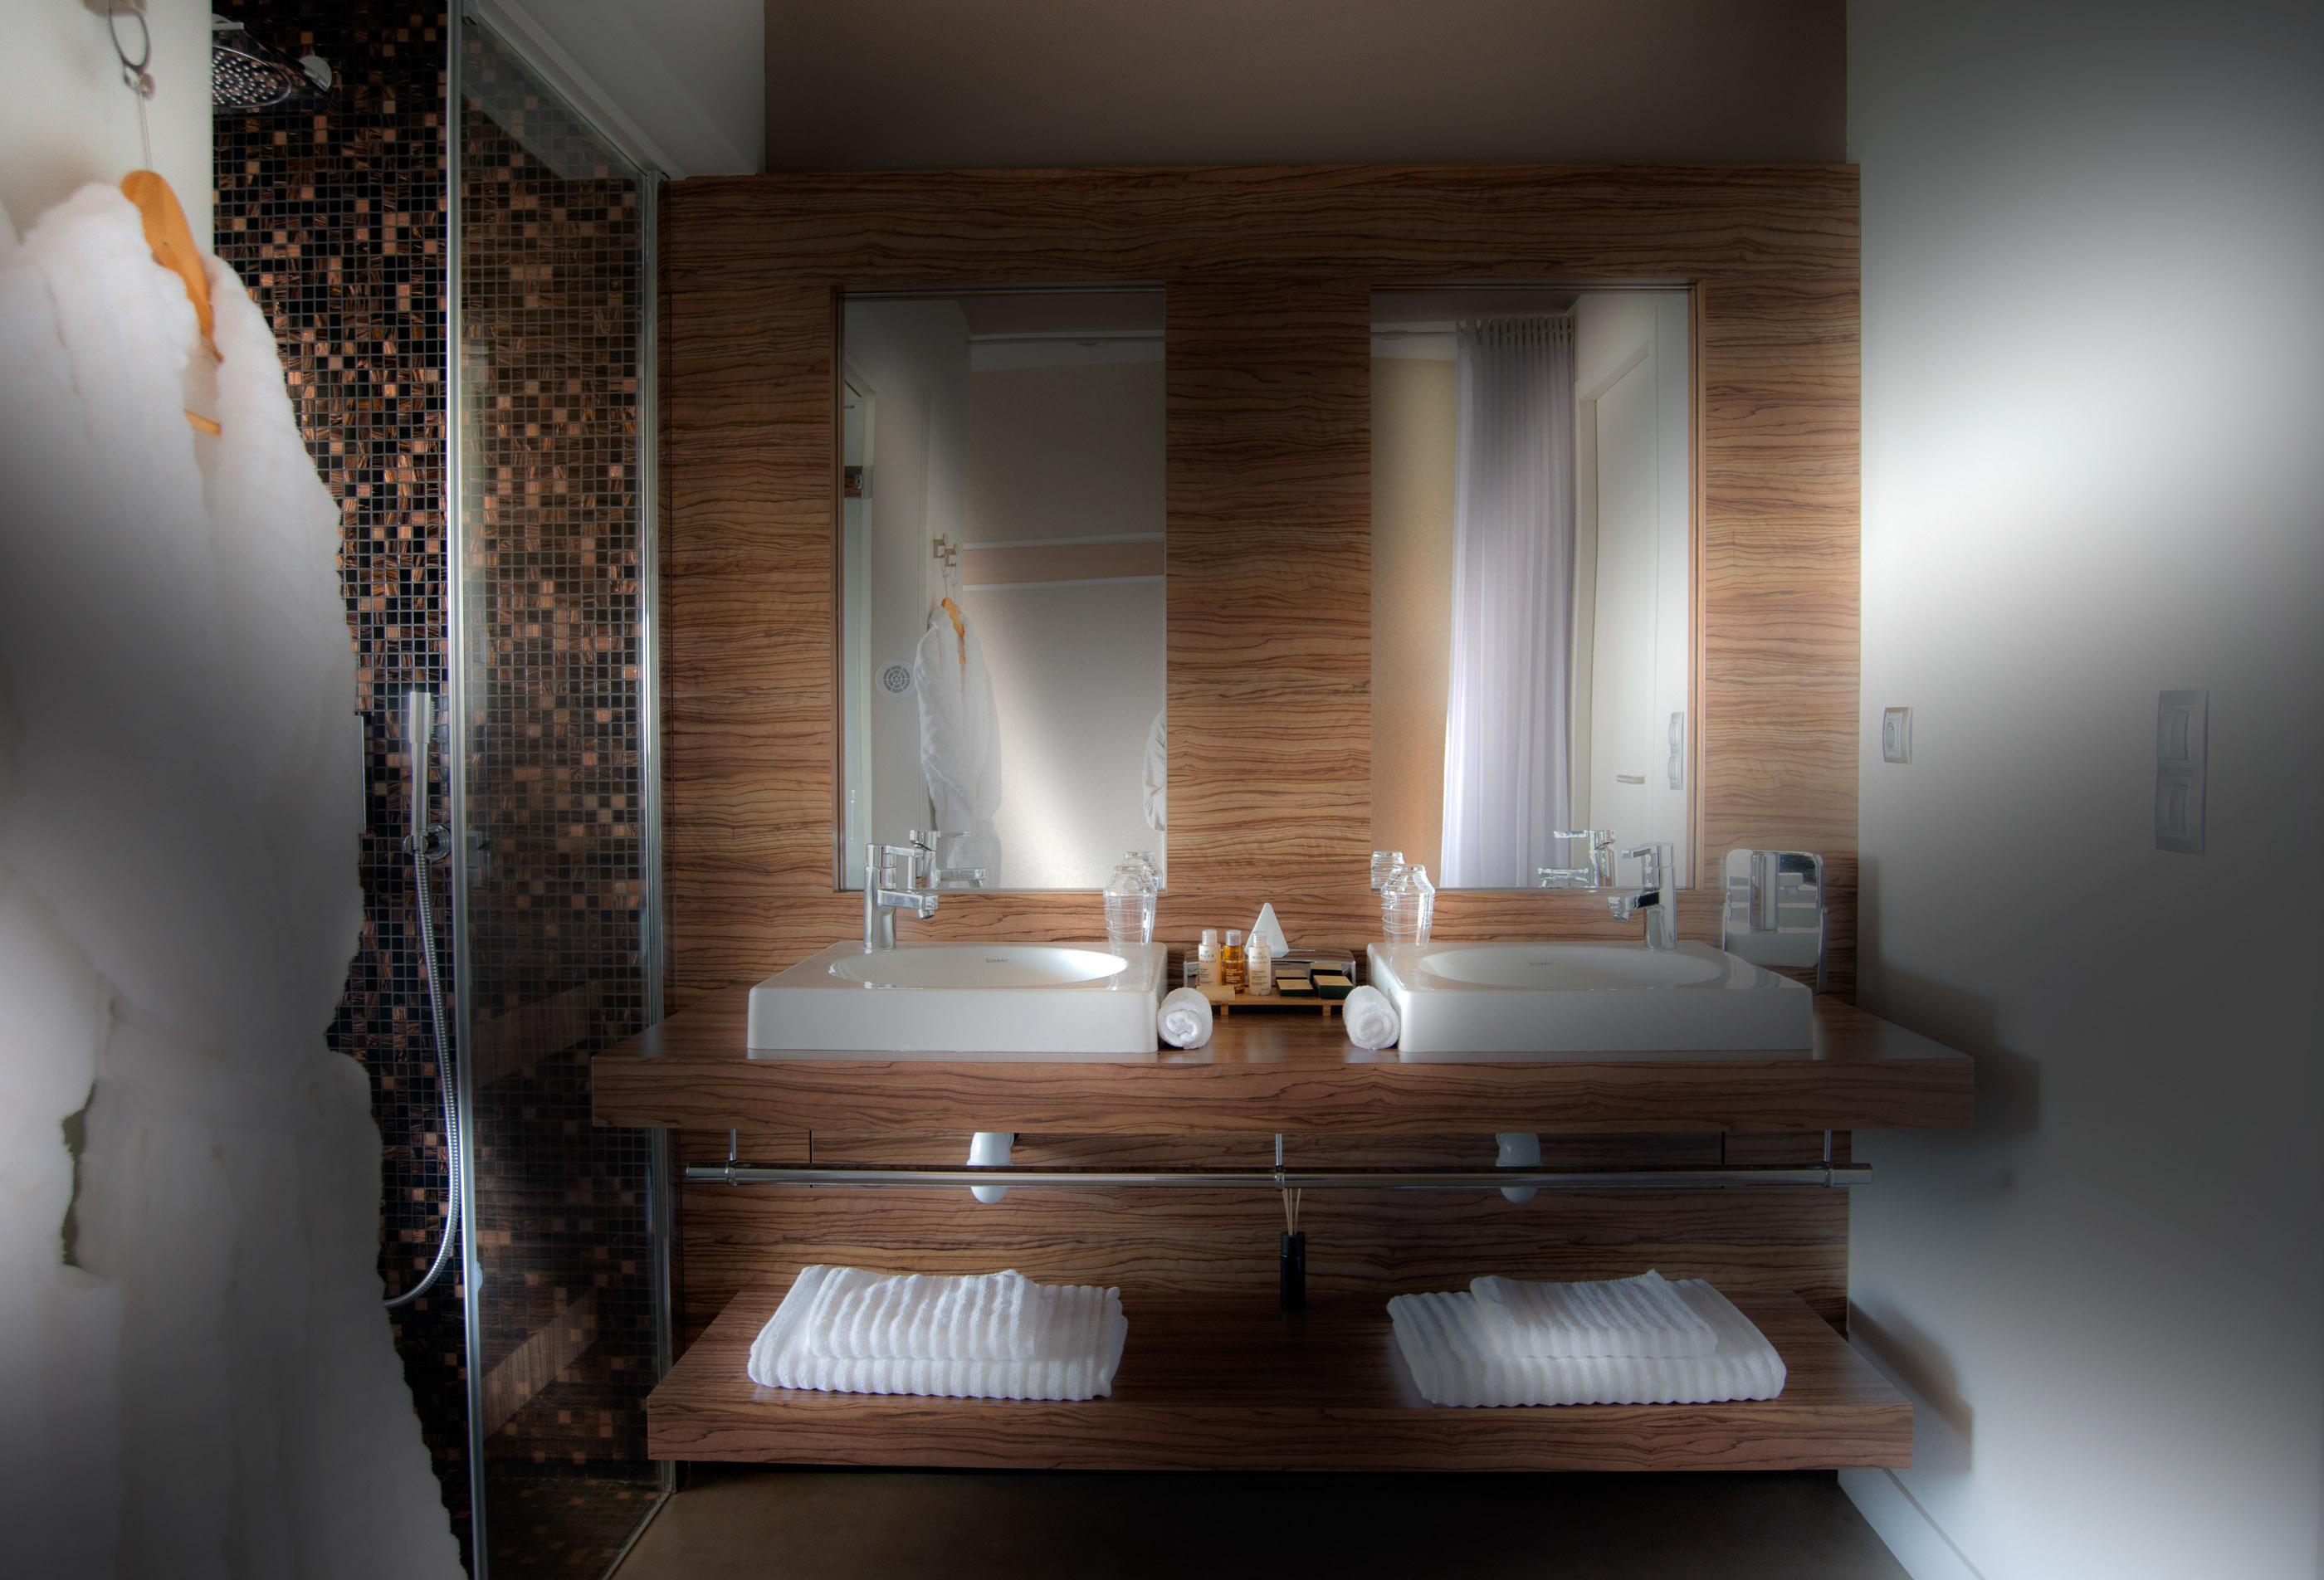 Salle de bainOrigines® ·Hotel Puy de Dôme, Issoire